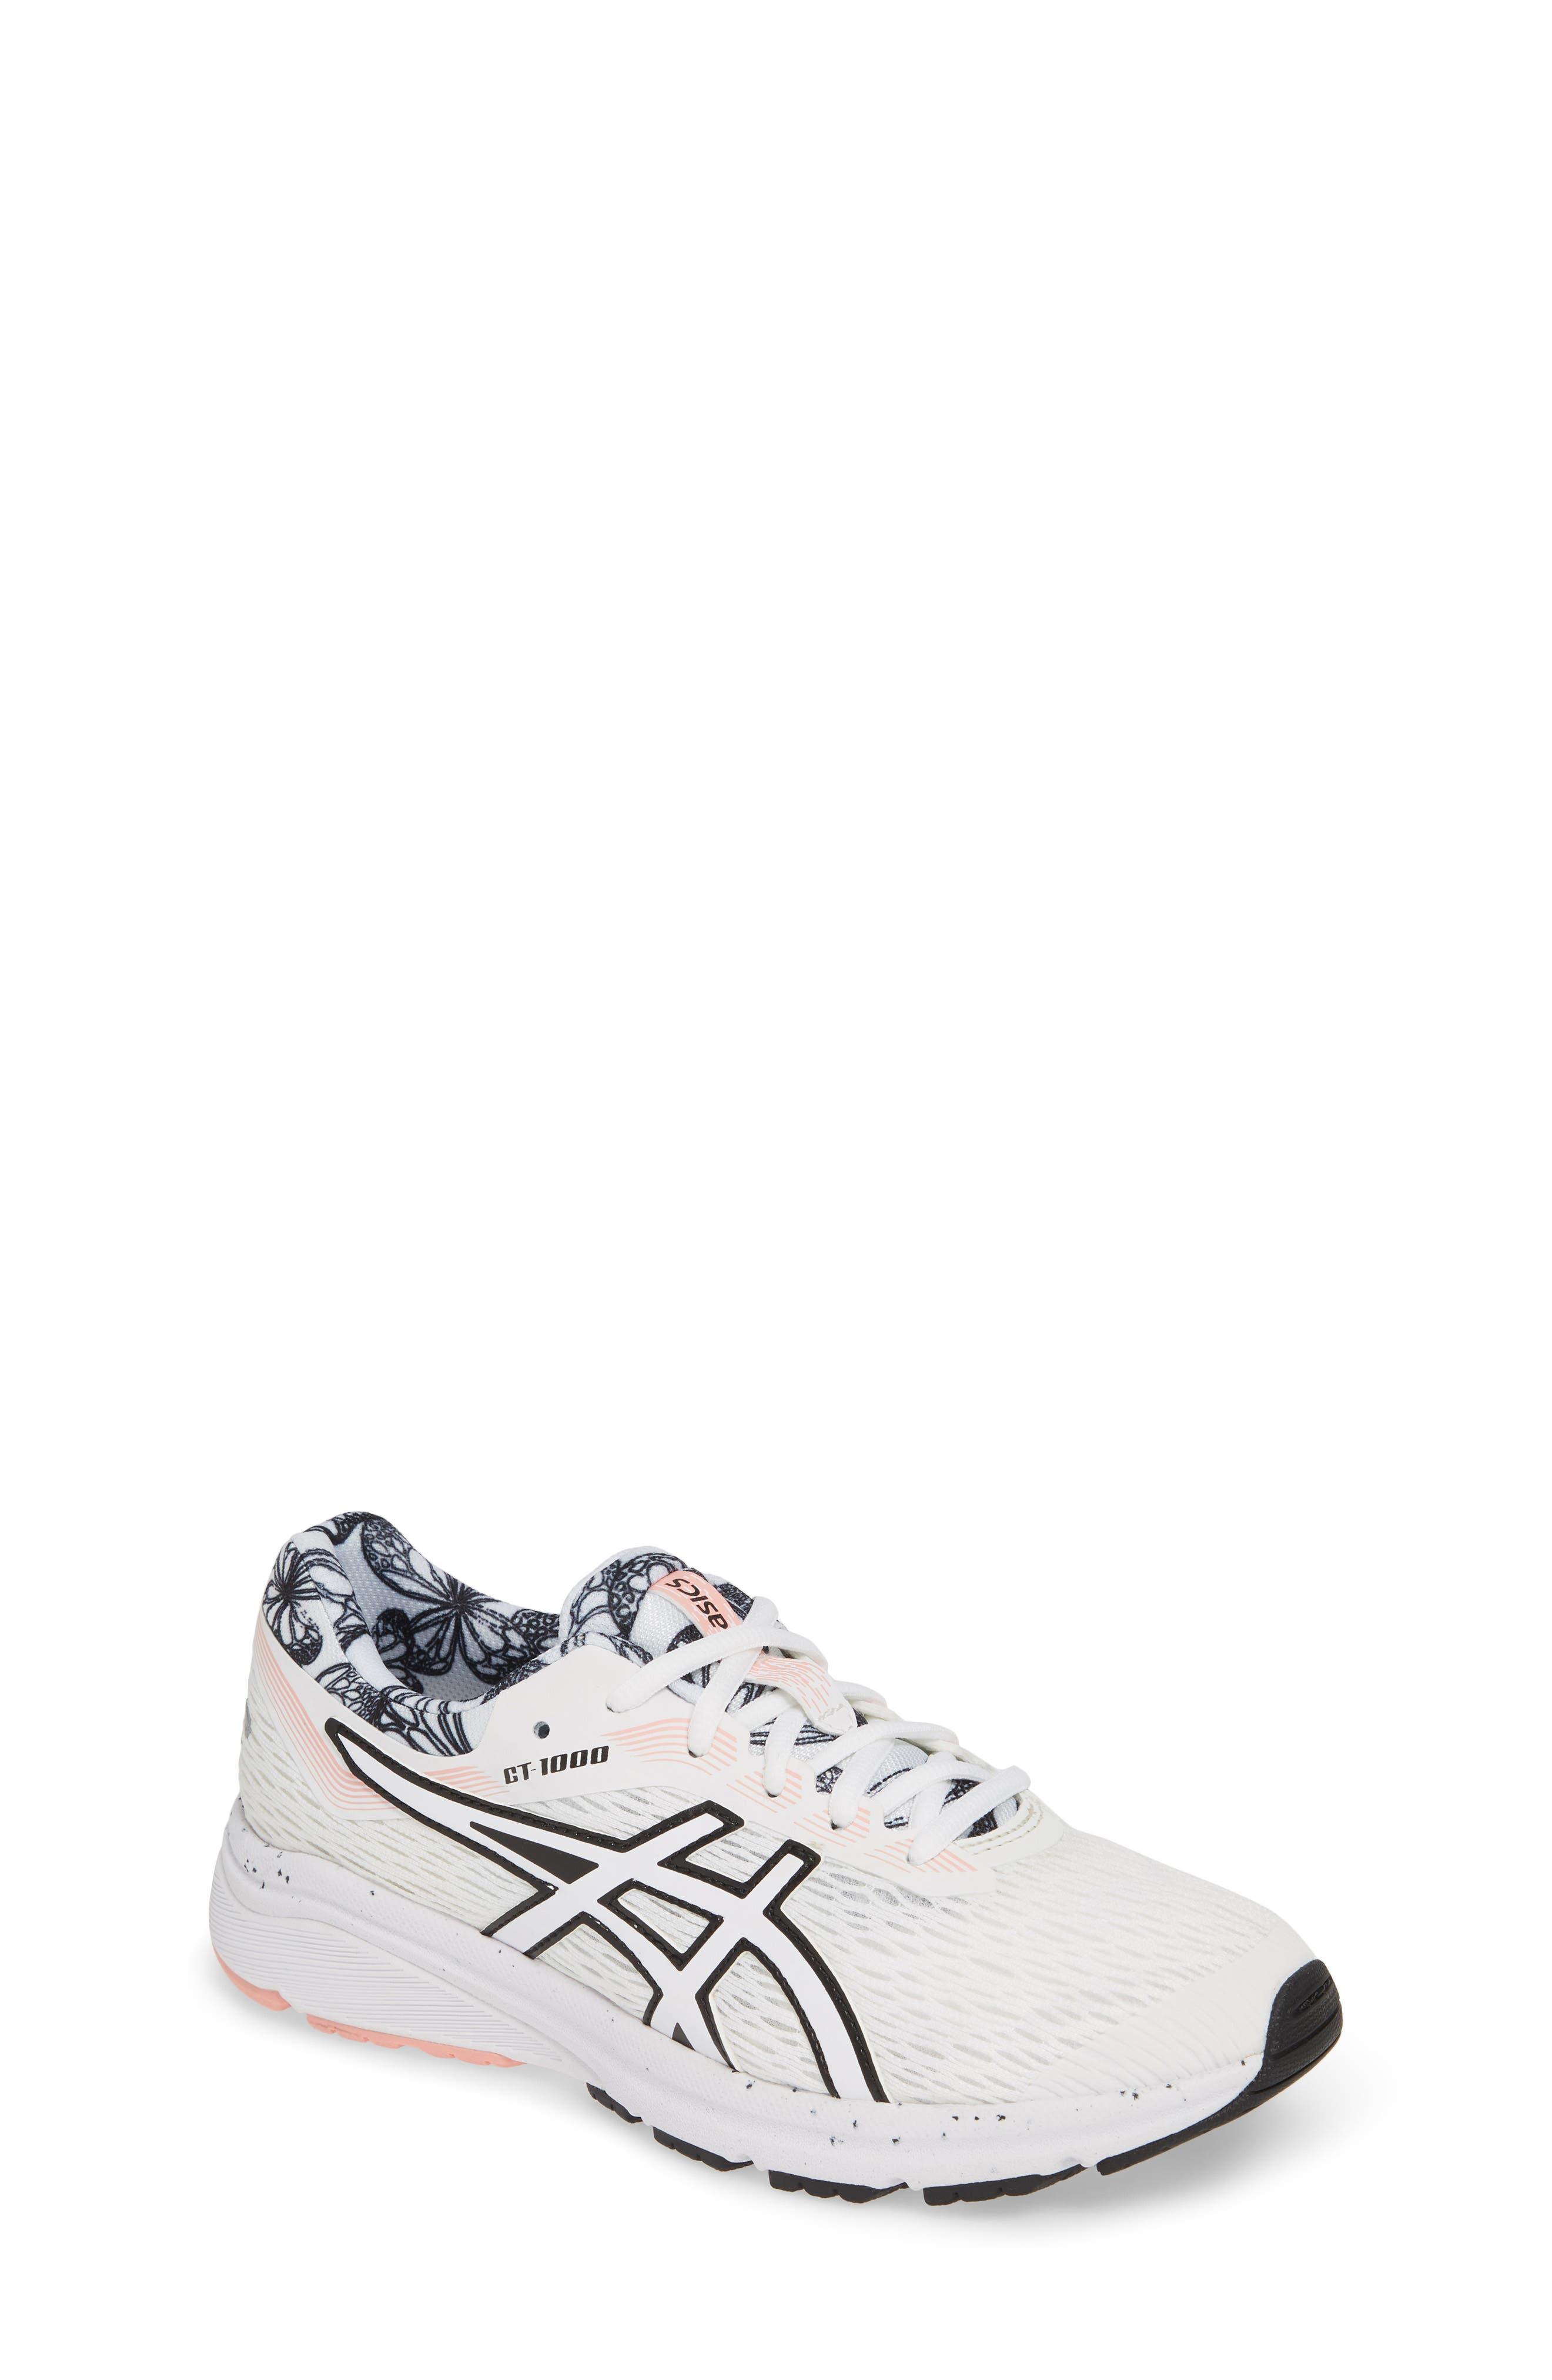 ASICS<SUP>®</SUP>, GT 1000 7 Running Shoe, Main thumbnail 1, color, WHITE/ WHITE